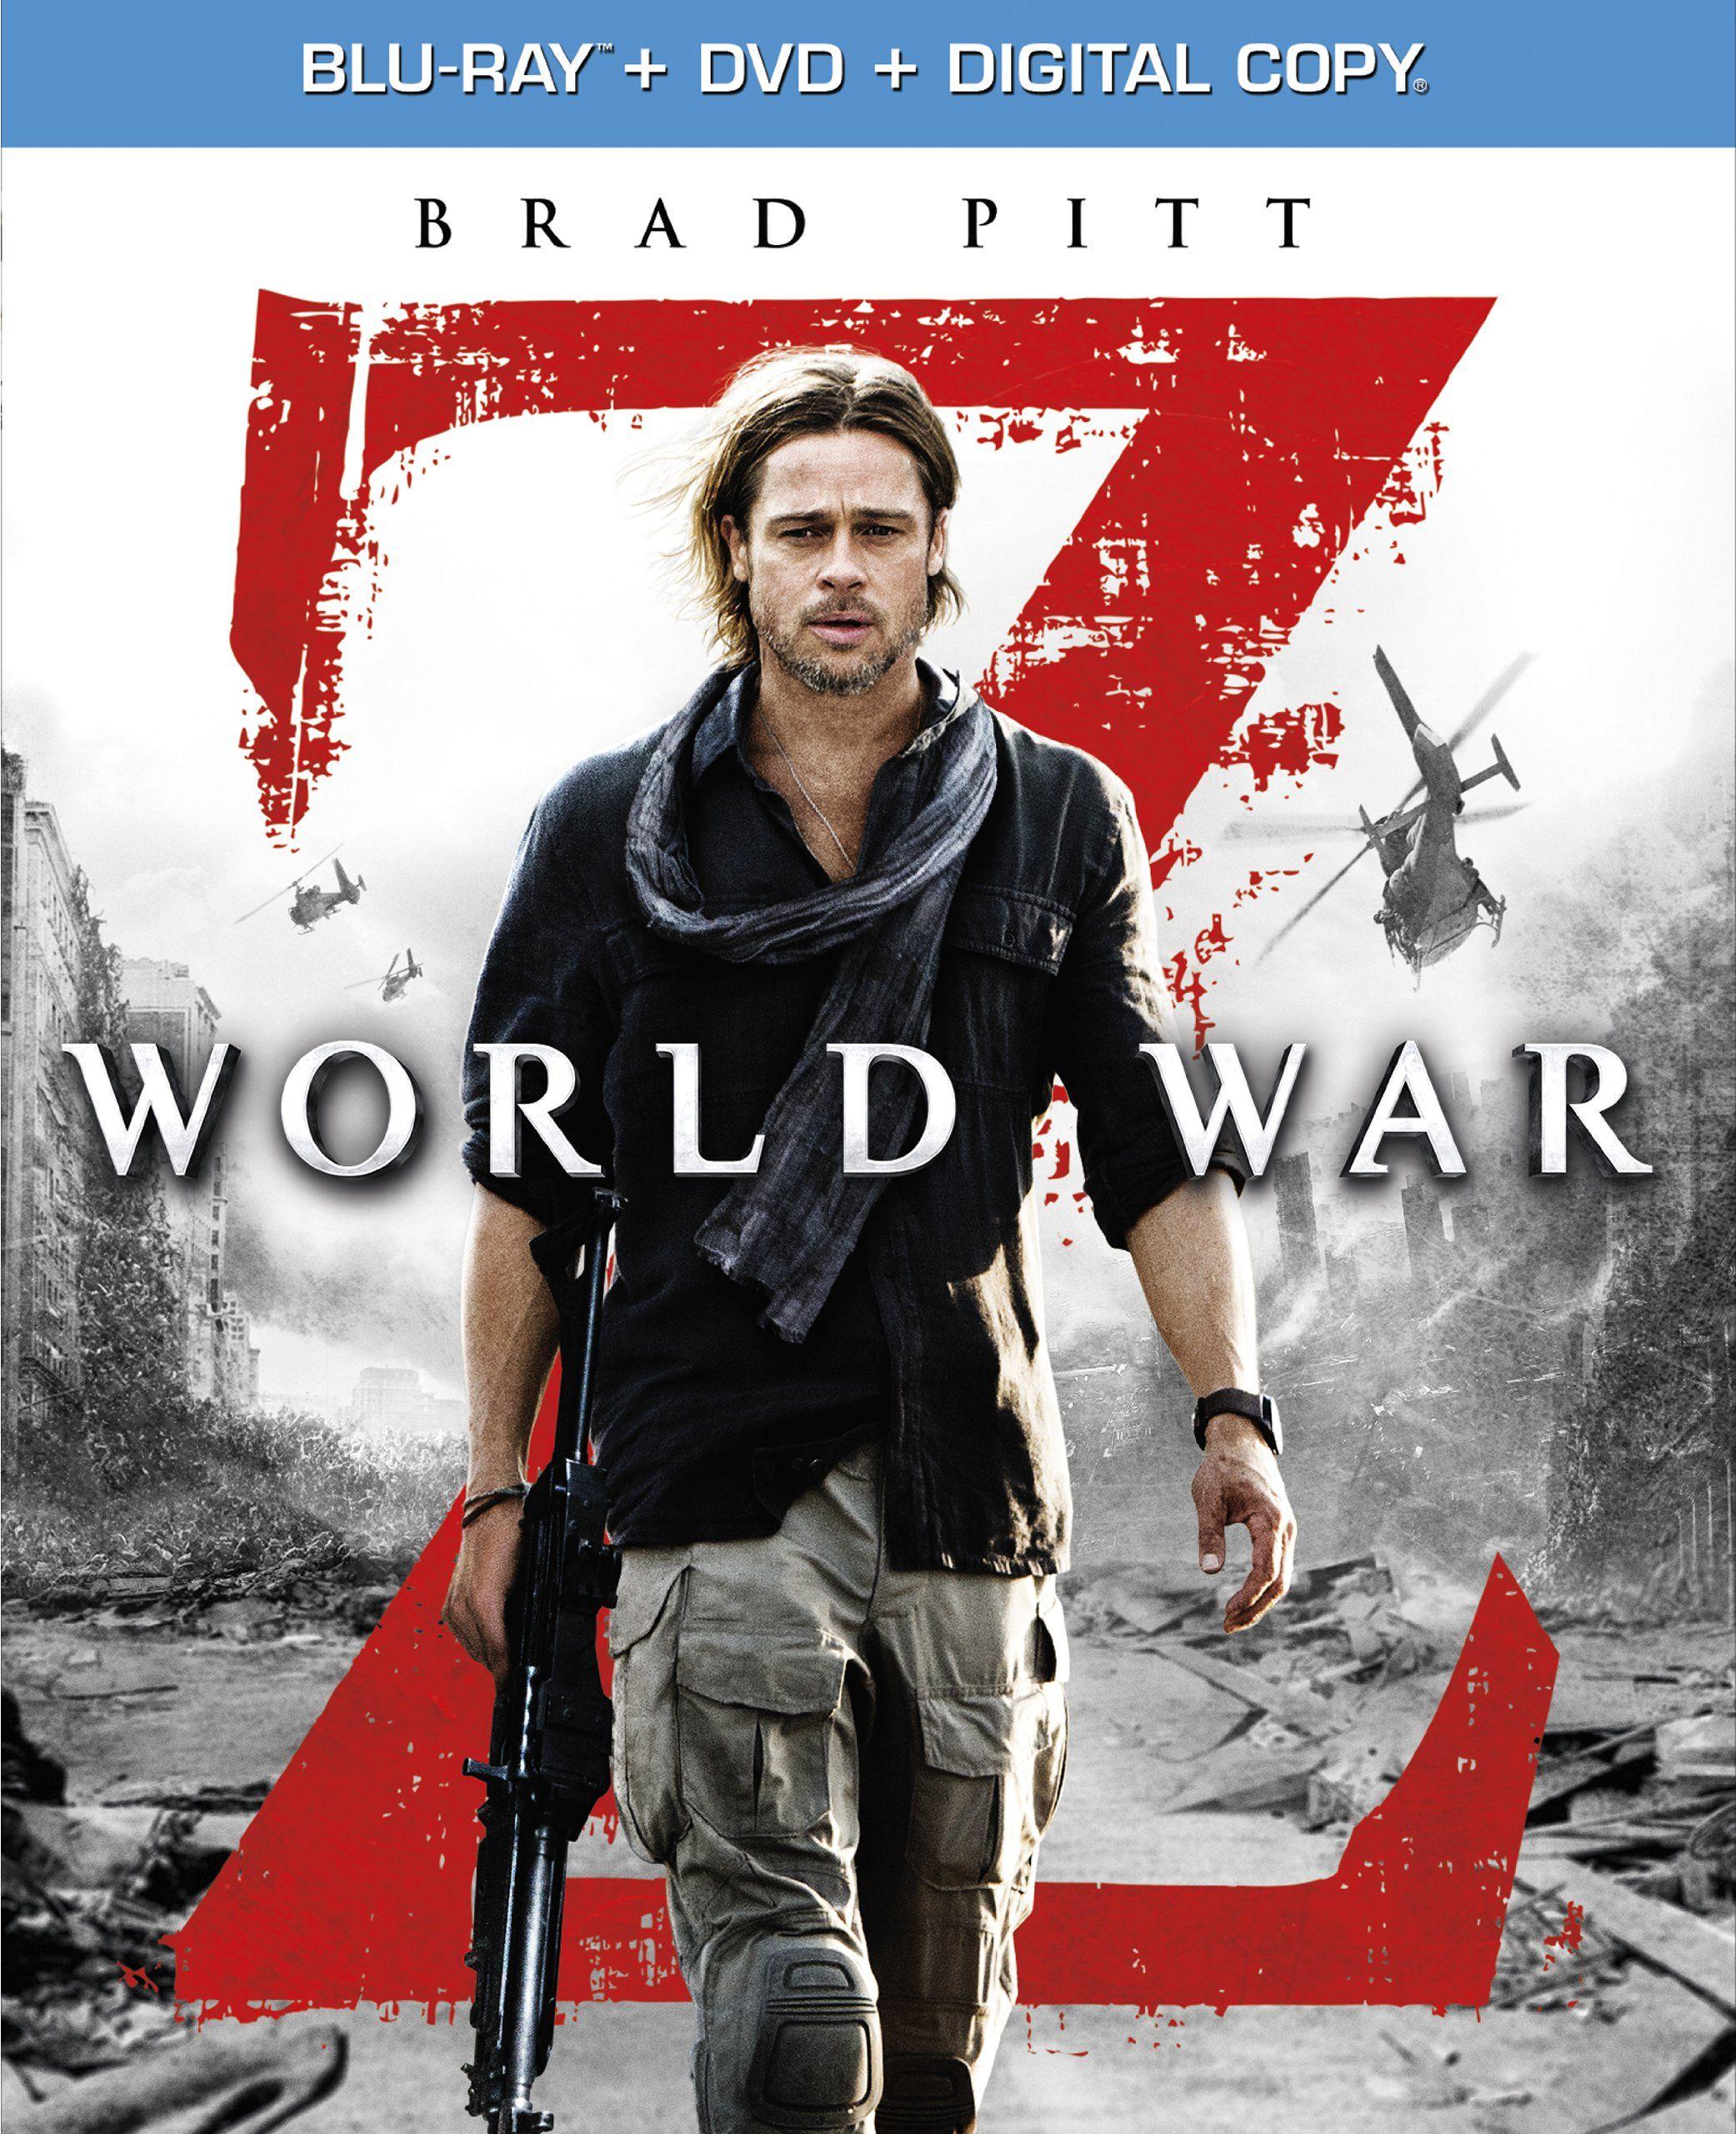 World War Z Blu-ray Review | High Def Digest